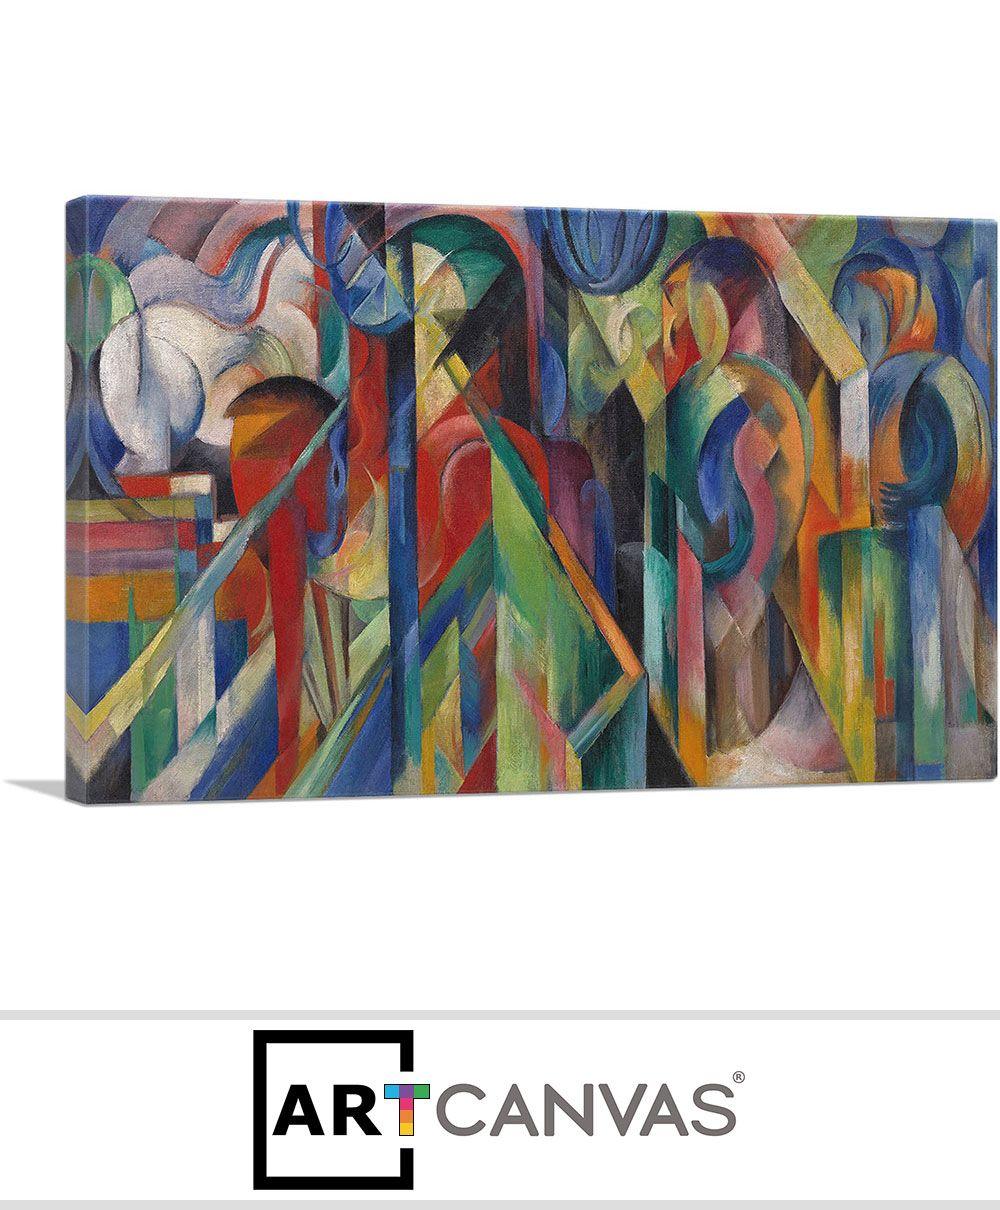 Stables 1913 Canvas Art Art Canvas Art Prints